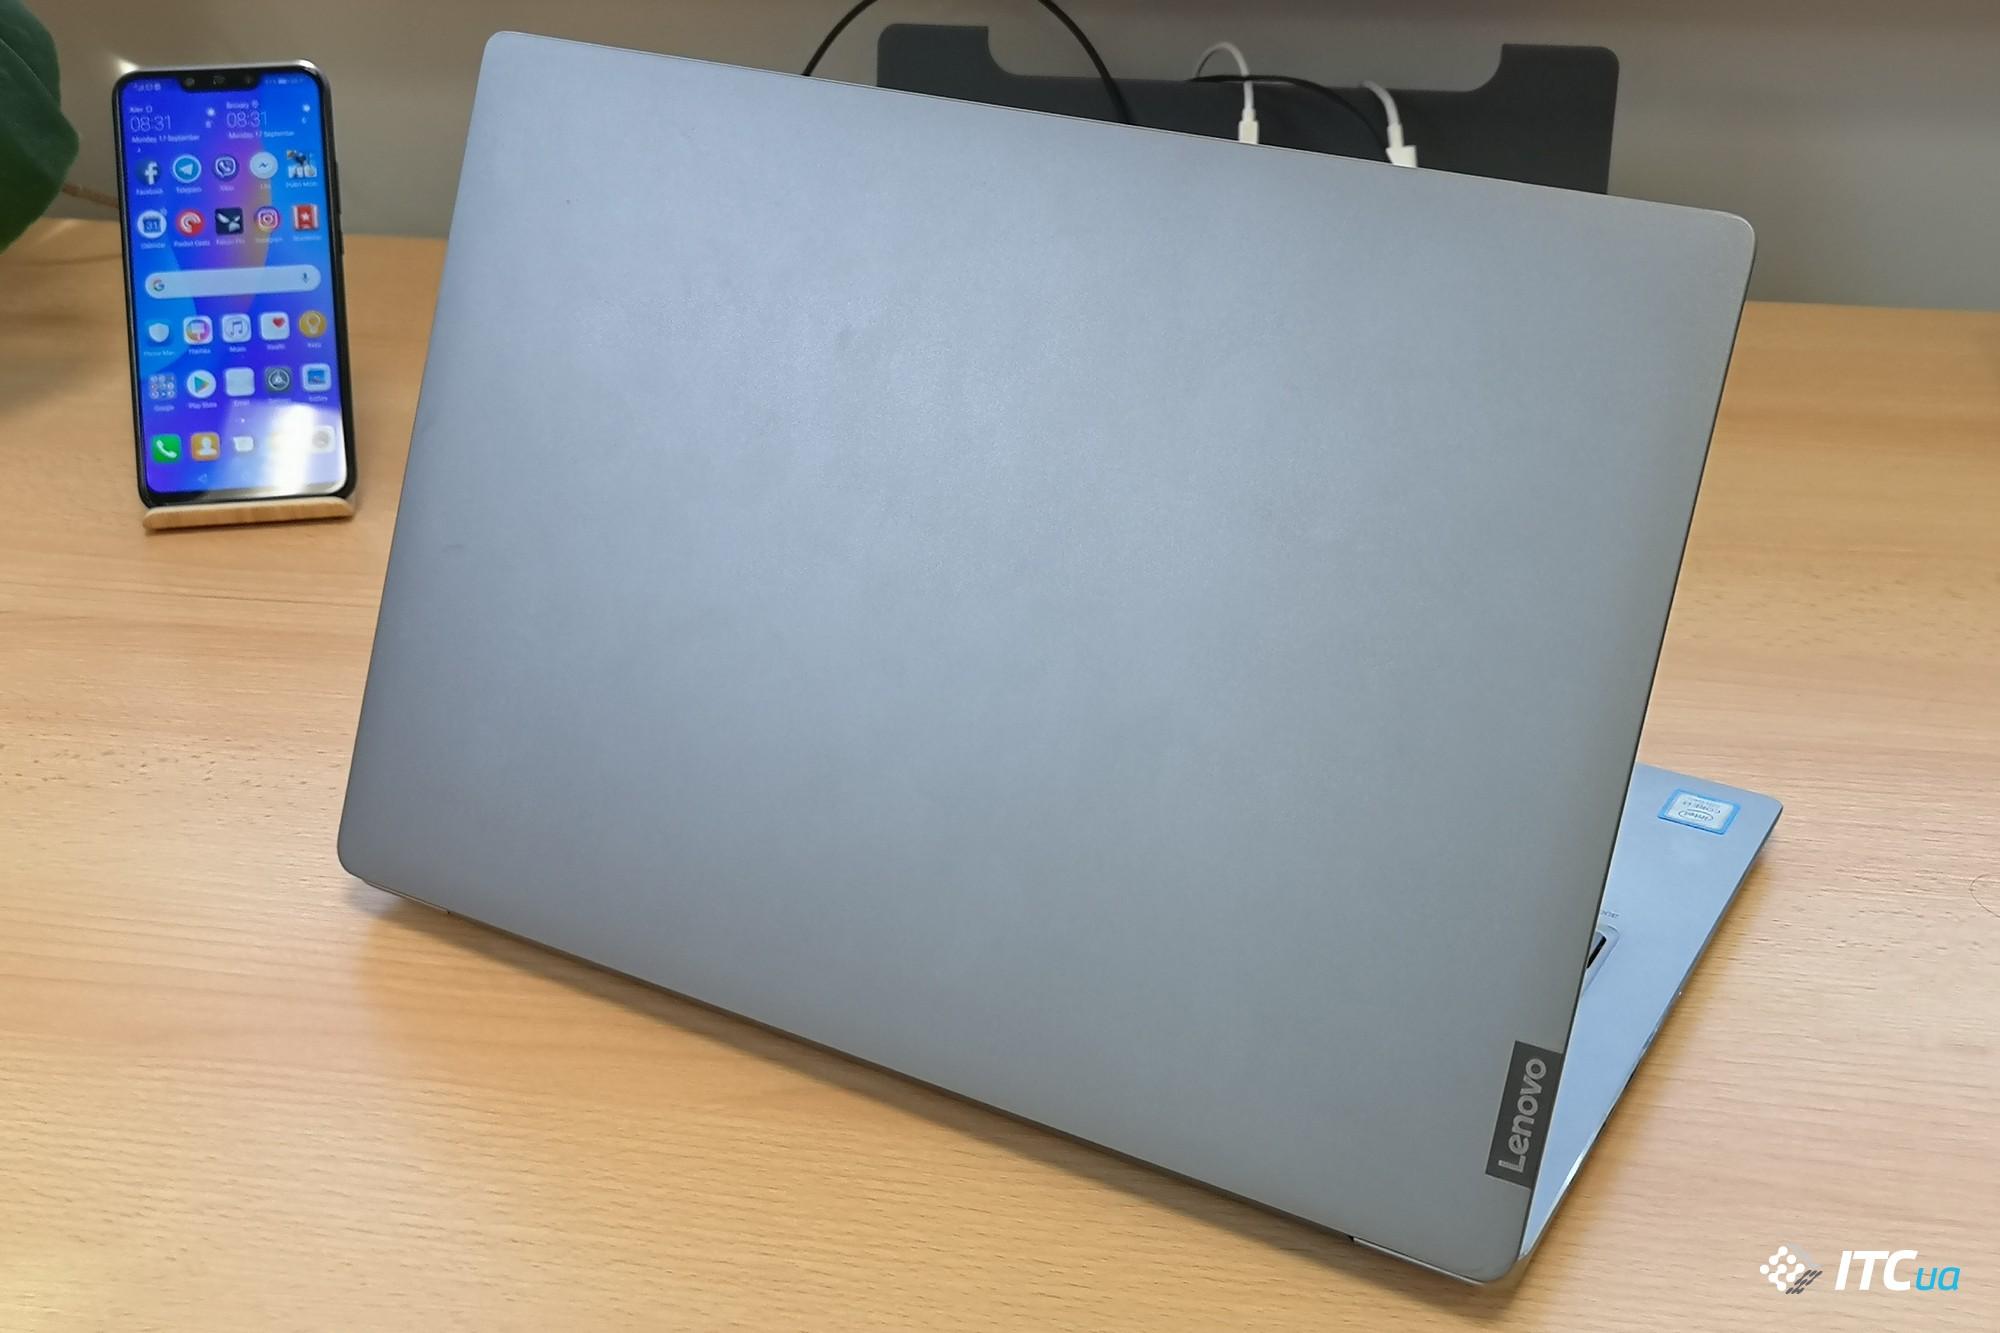 Обзор ноутбука Lenovo ideapad 530S-14IKB